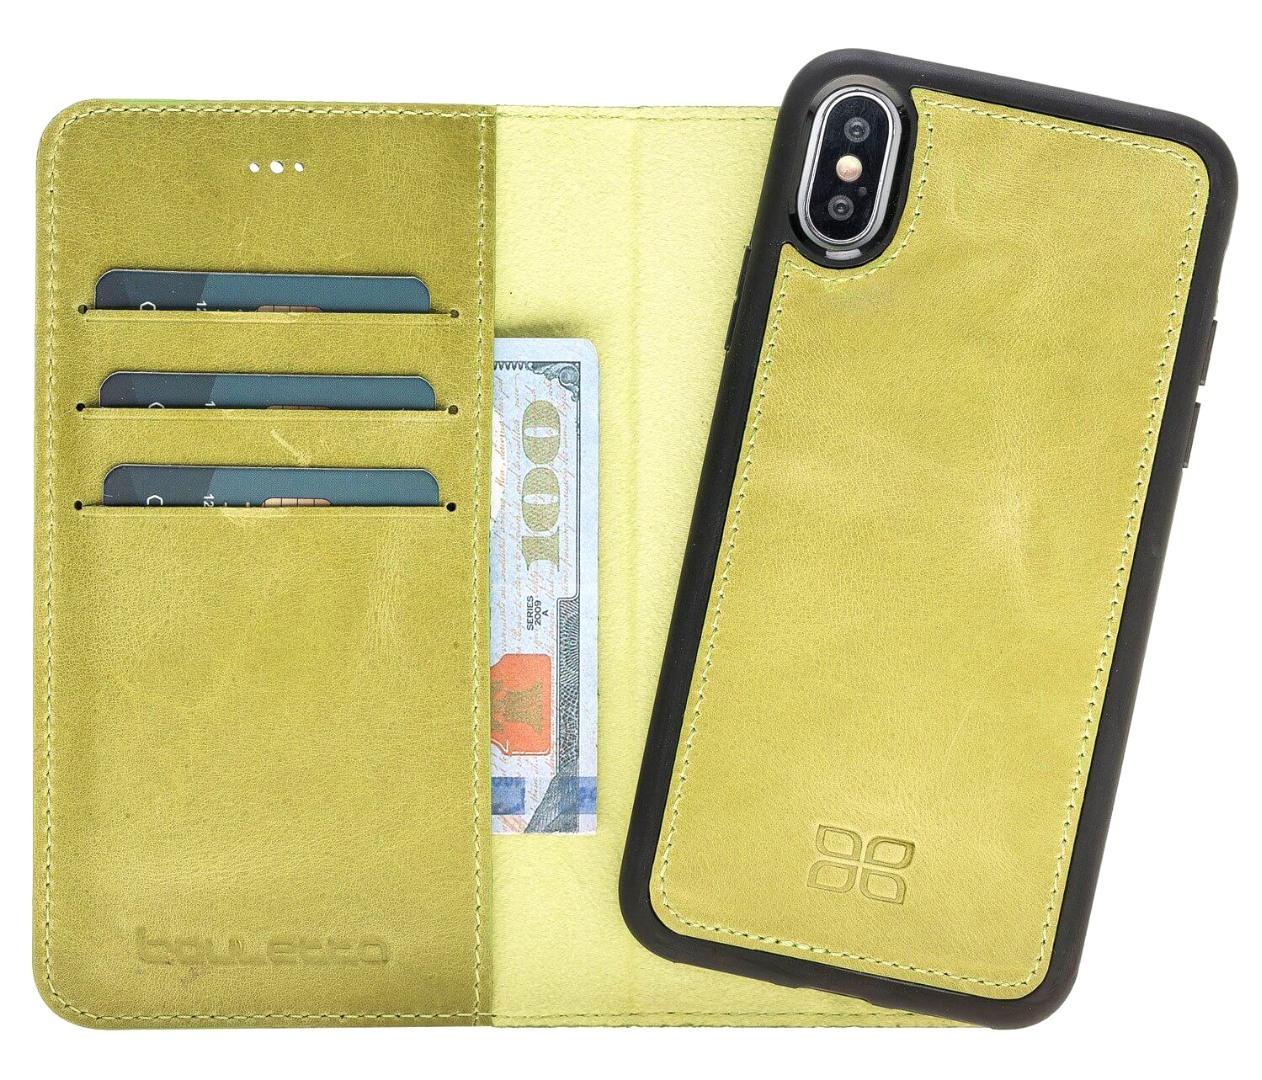 Husa piele naturala 2 in 1, tip portofel + back cover, iPhone X / XS - Bouletta Magic Wallet, Verde